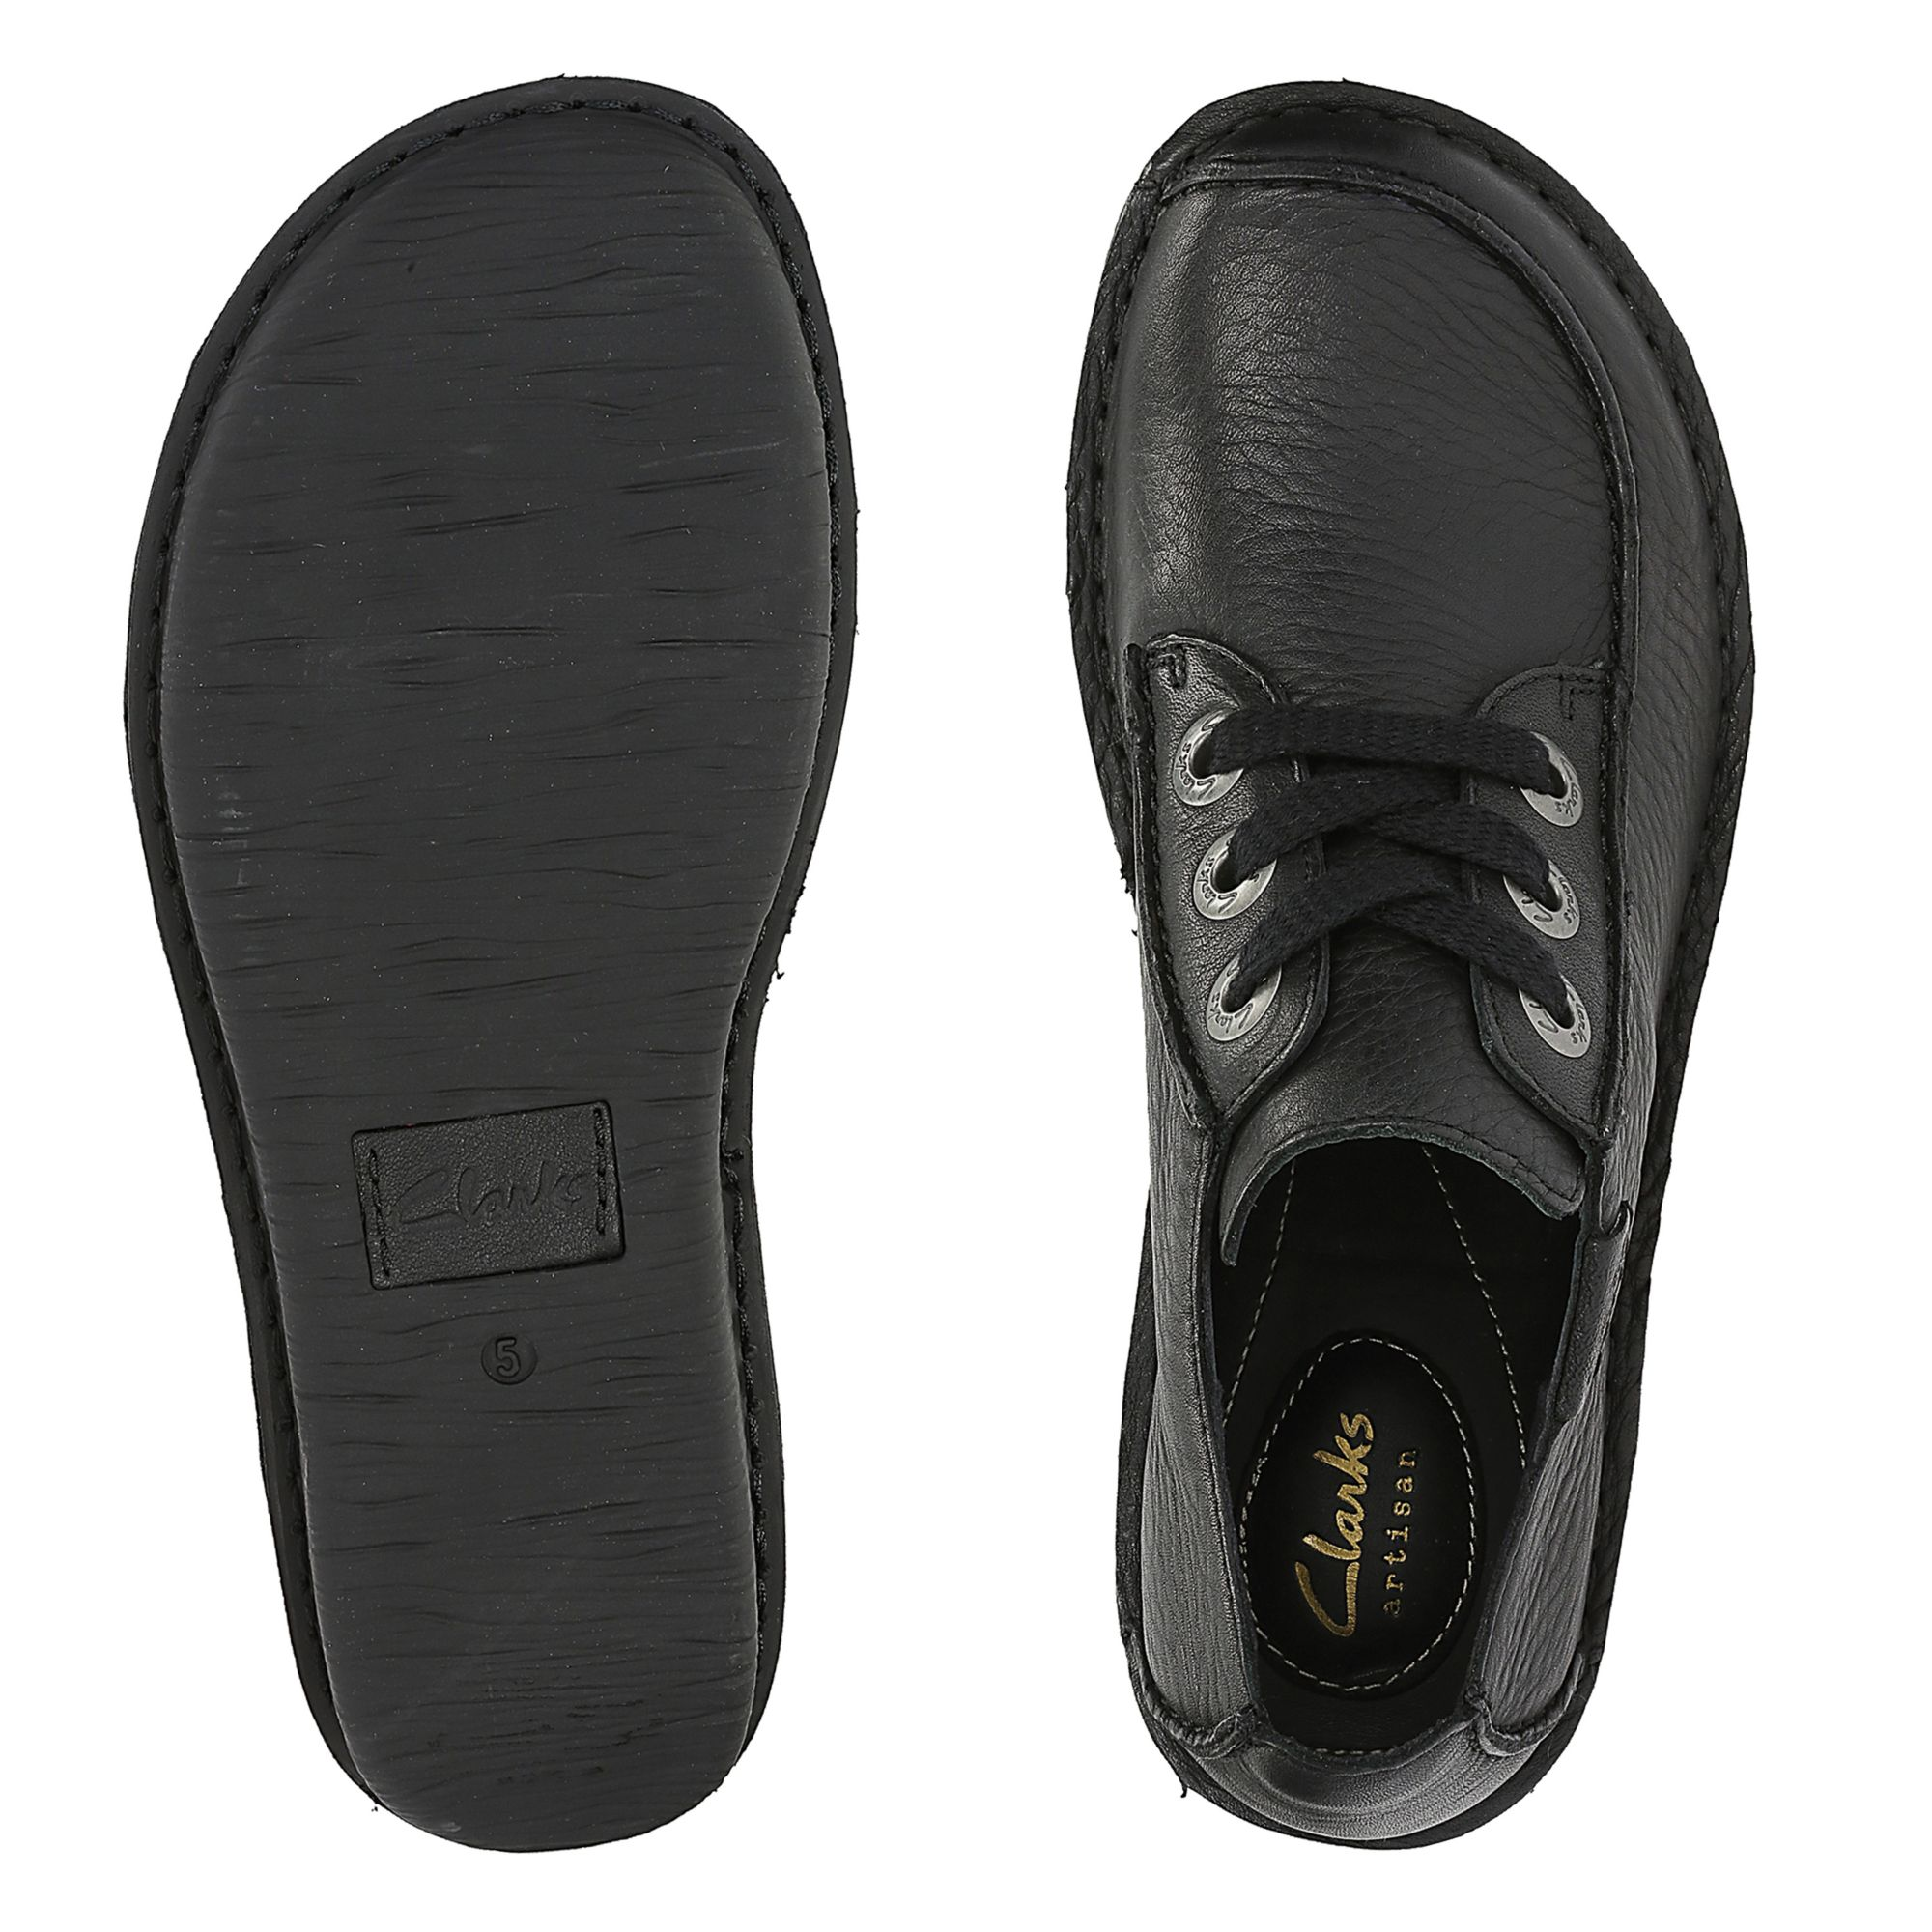 Women's Black Leather Flat Shoes